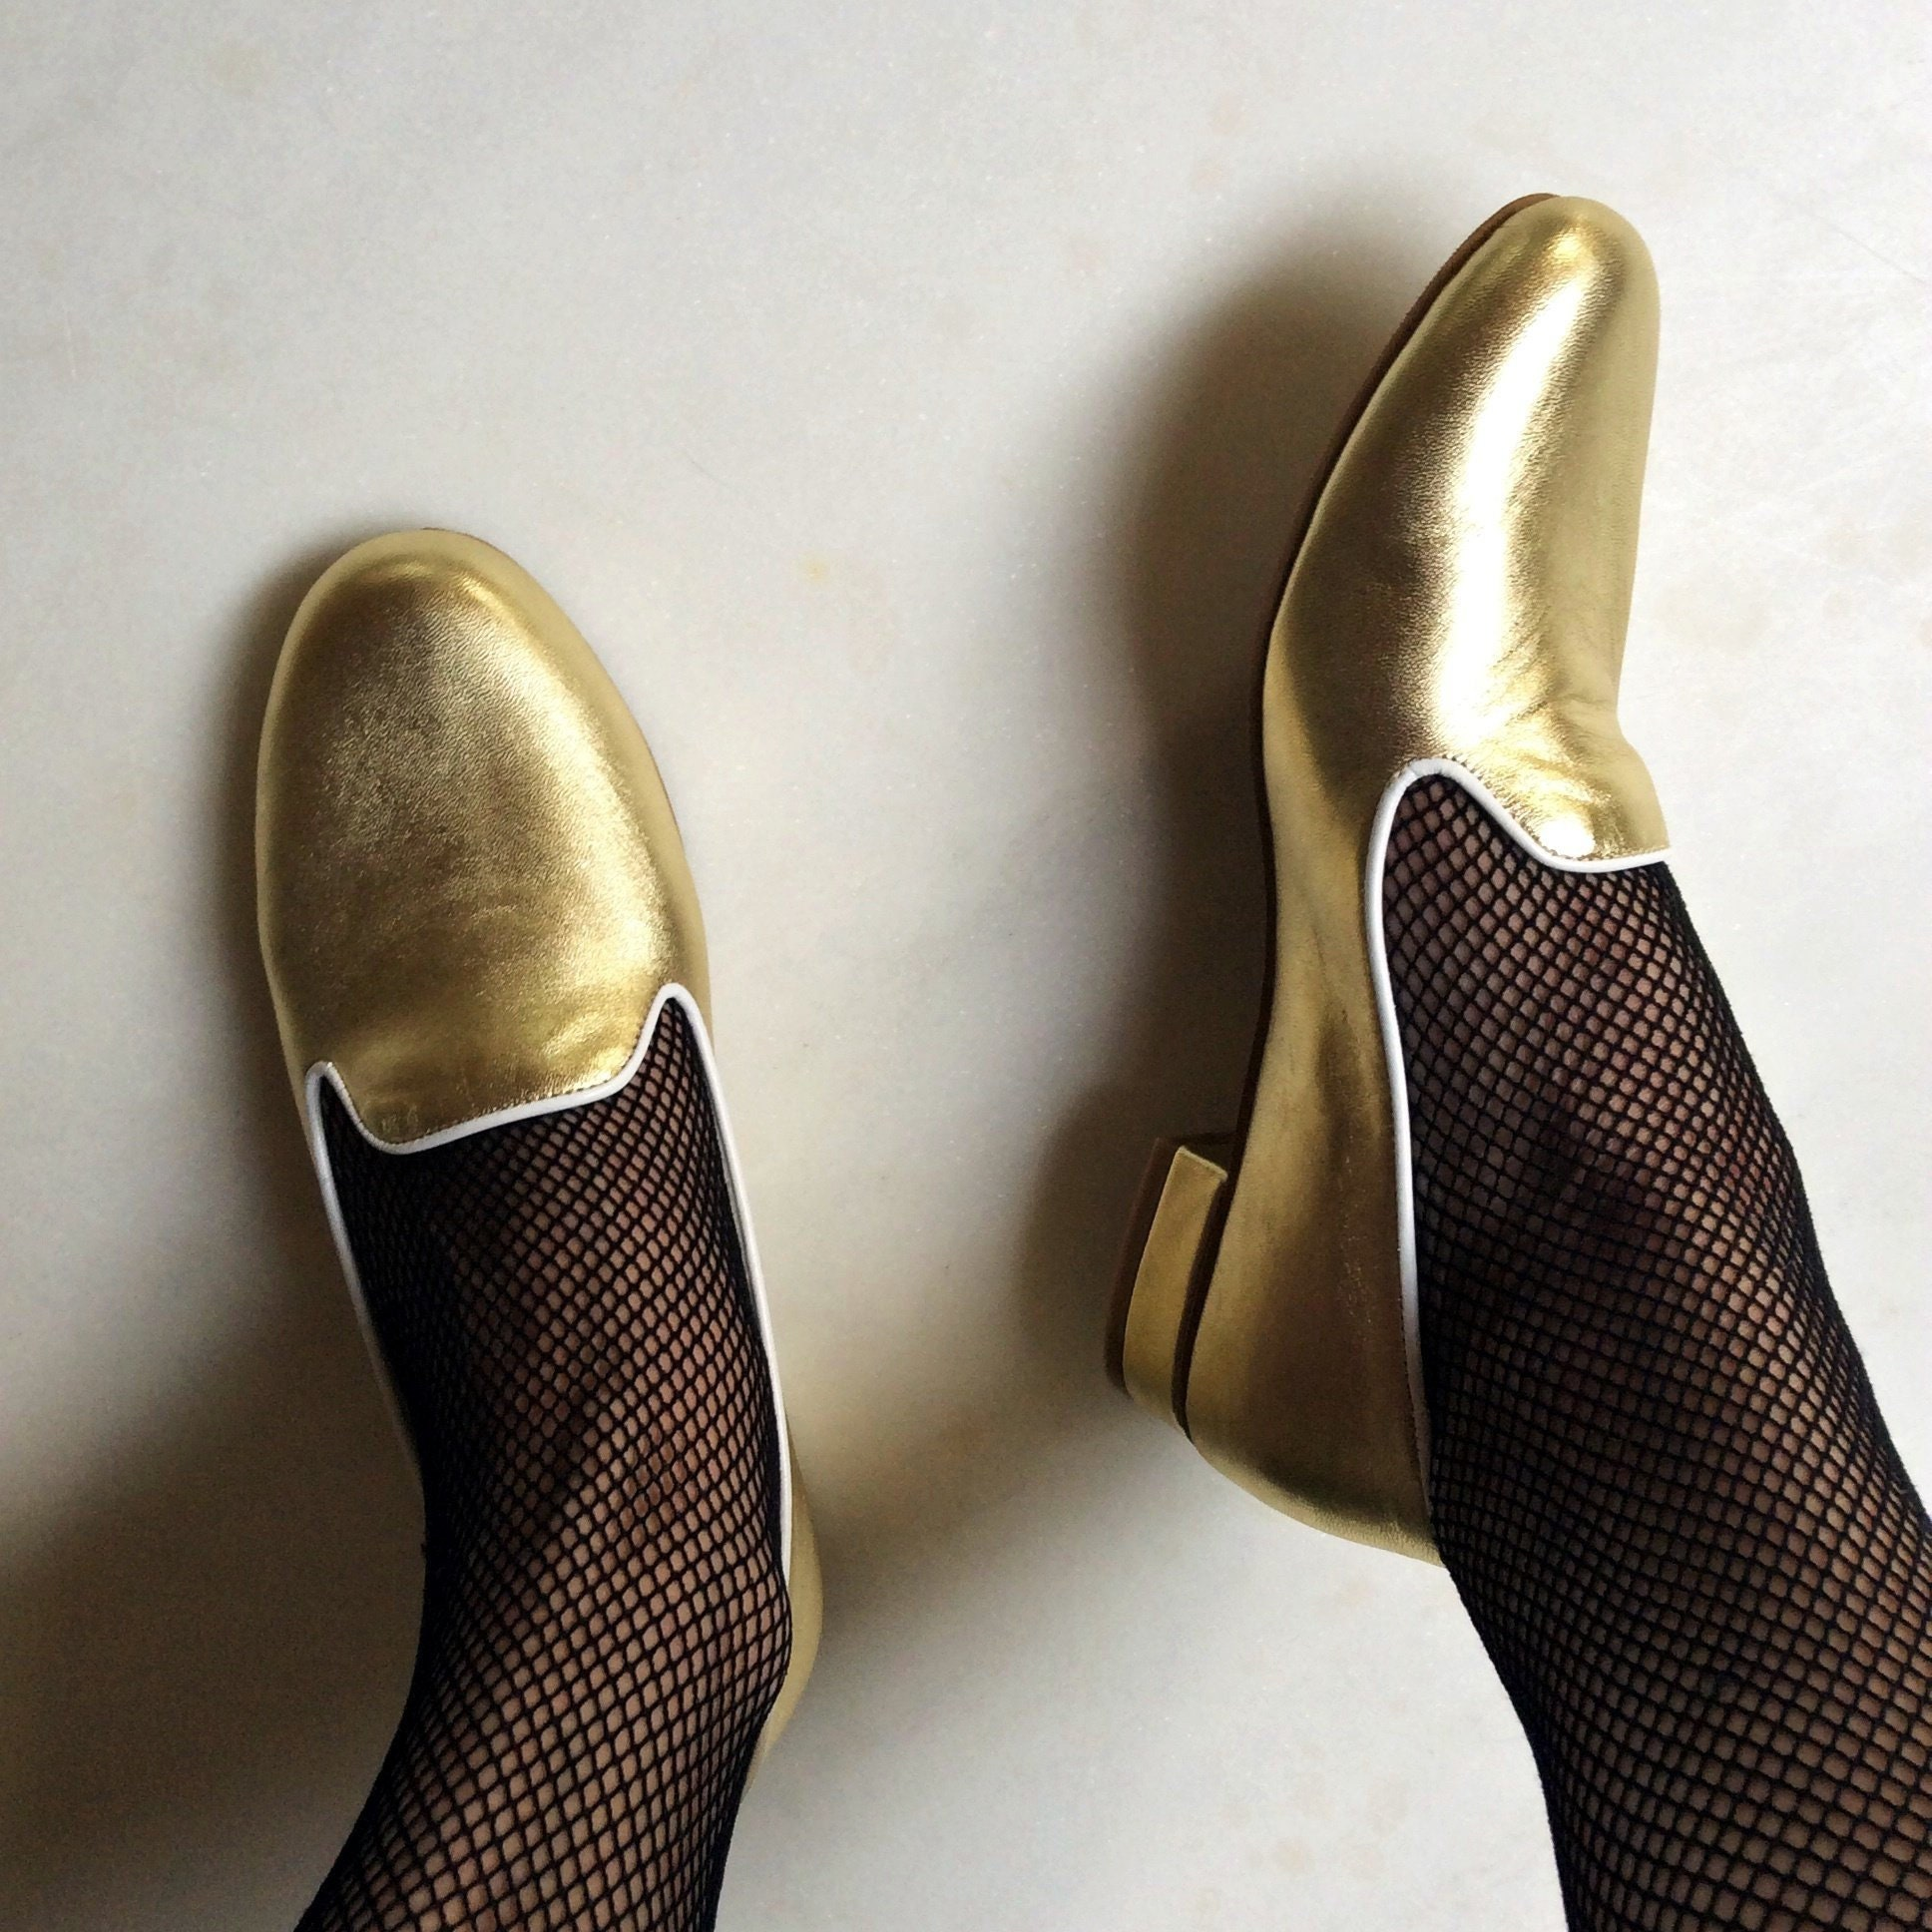 Chaussures femme femme Chaussures type ballerines. 7567f5